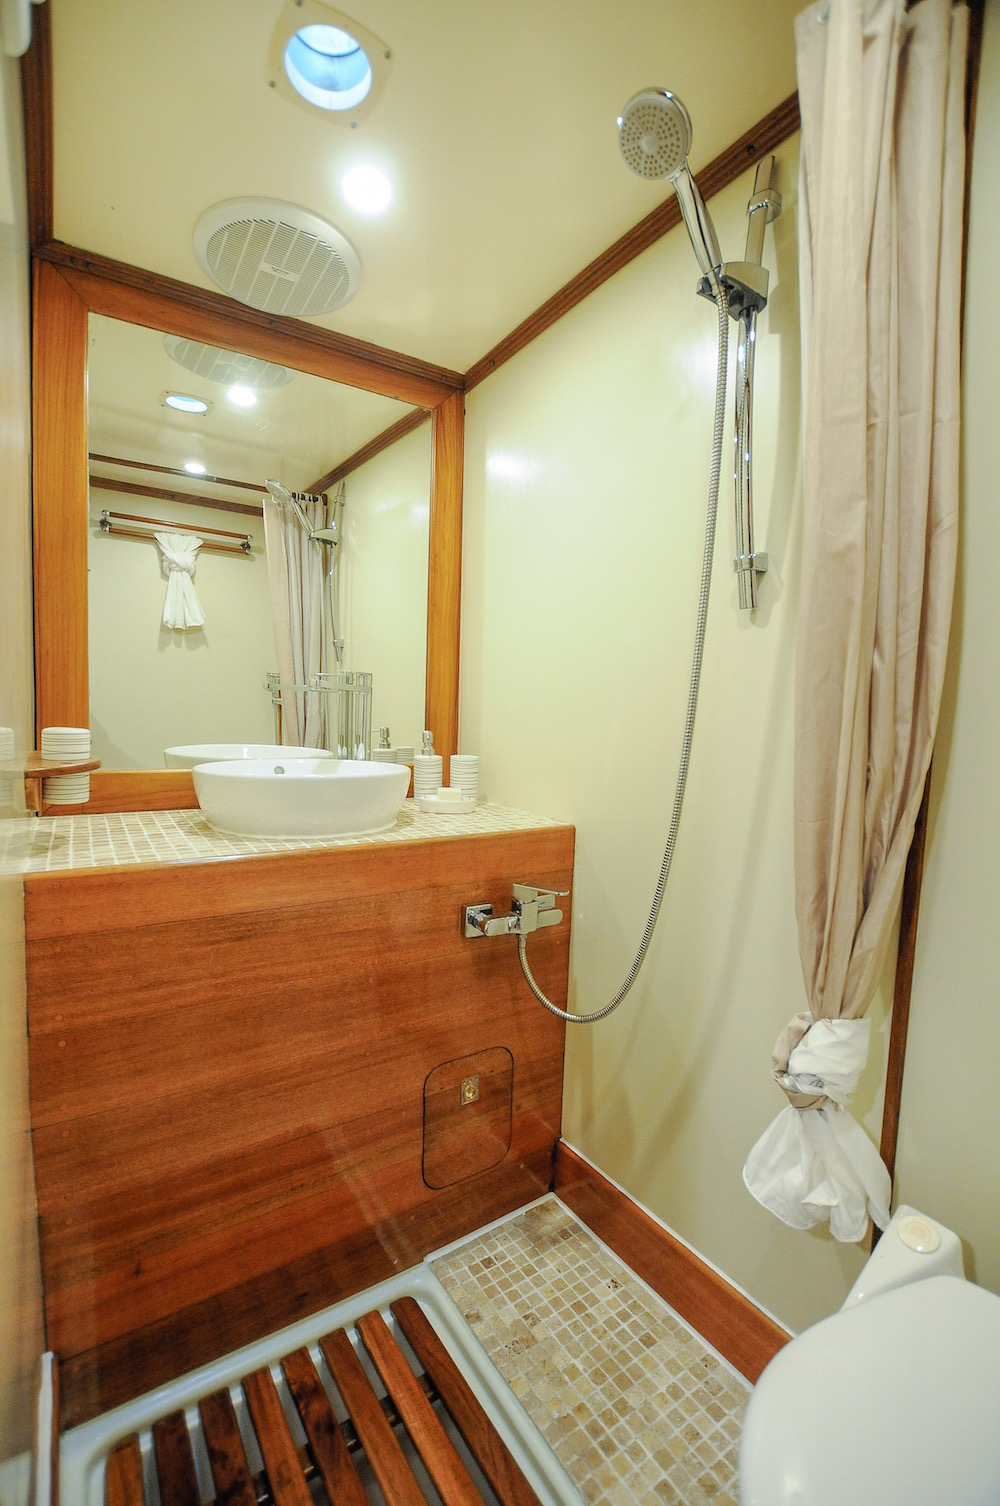 RAJA LAUT charter yacht - bathroom